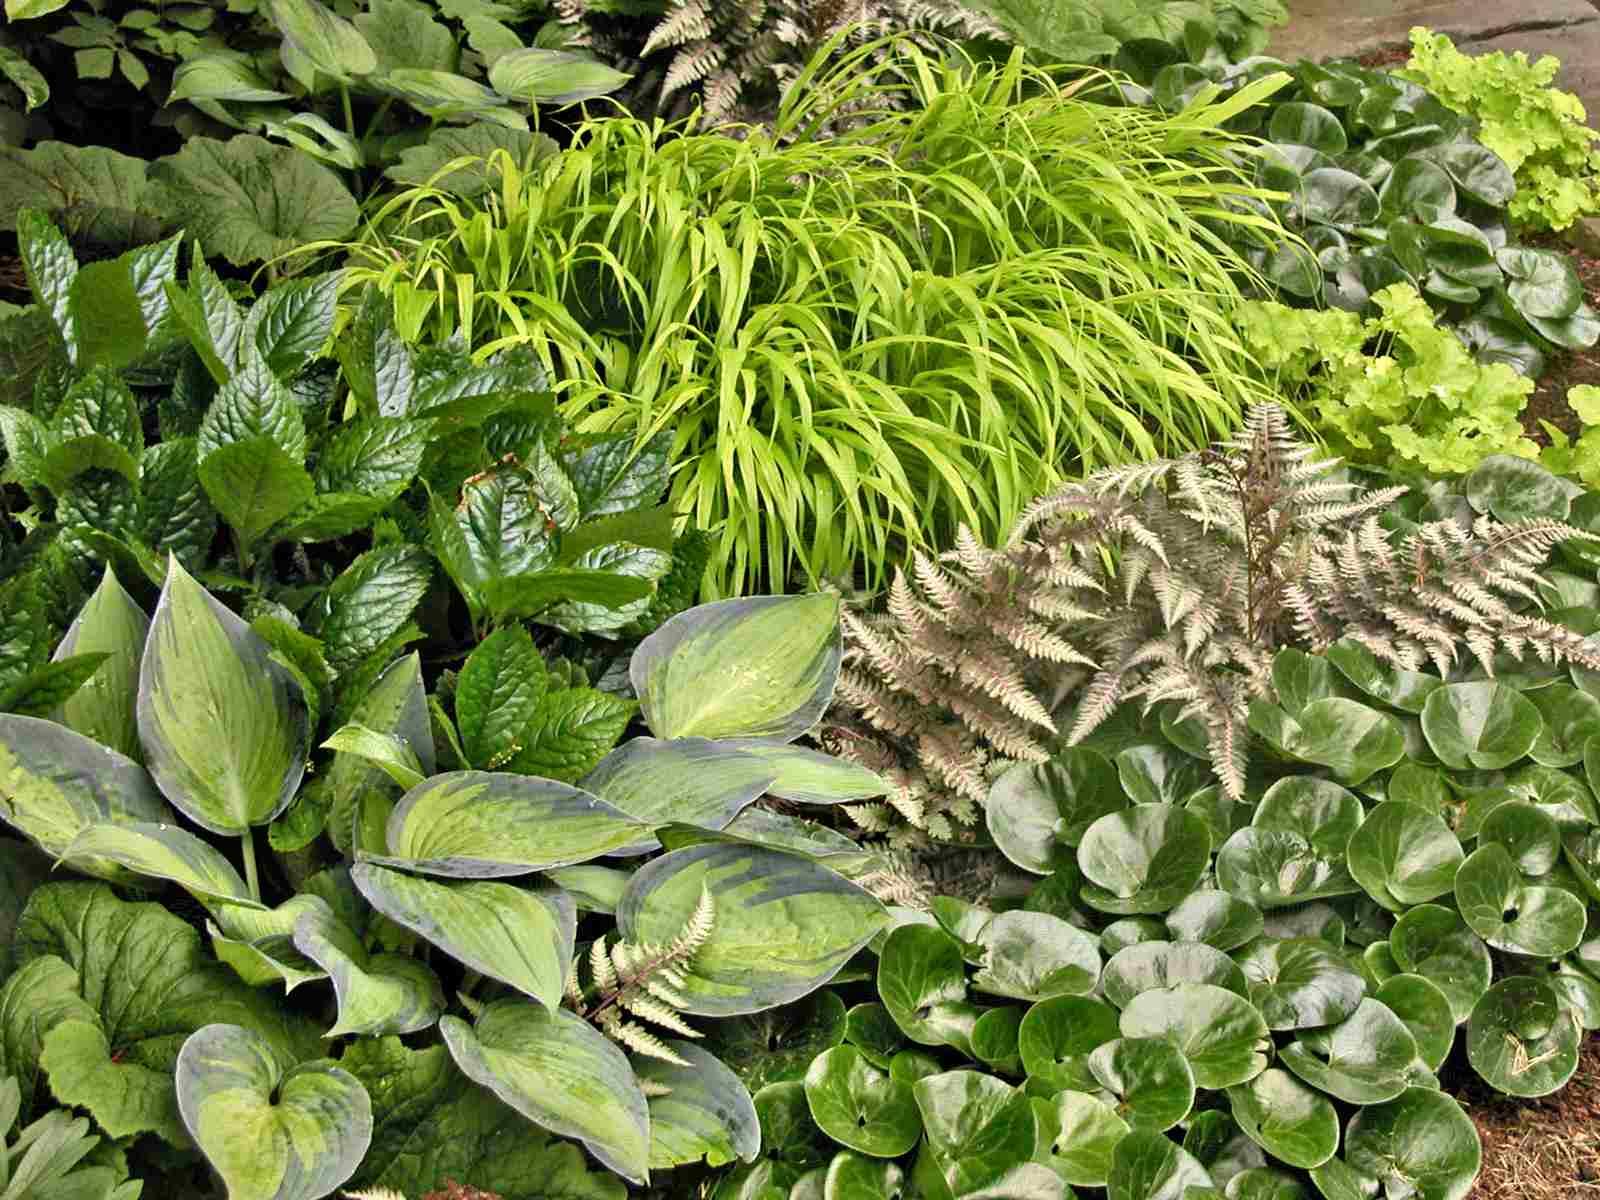 Un grupo de diferentes arbustos